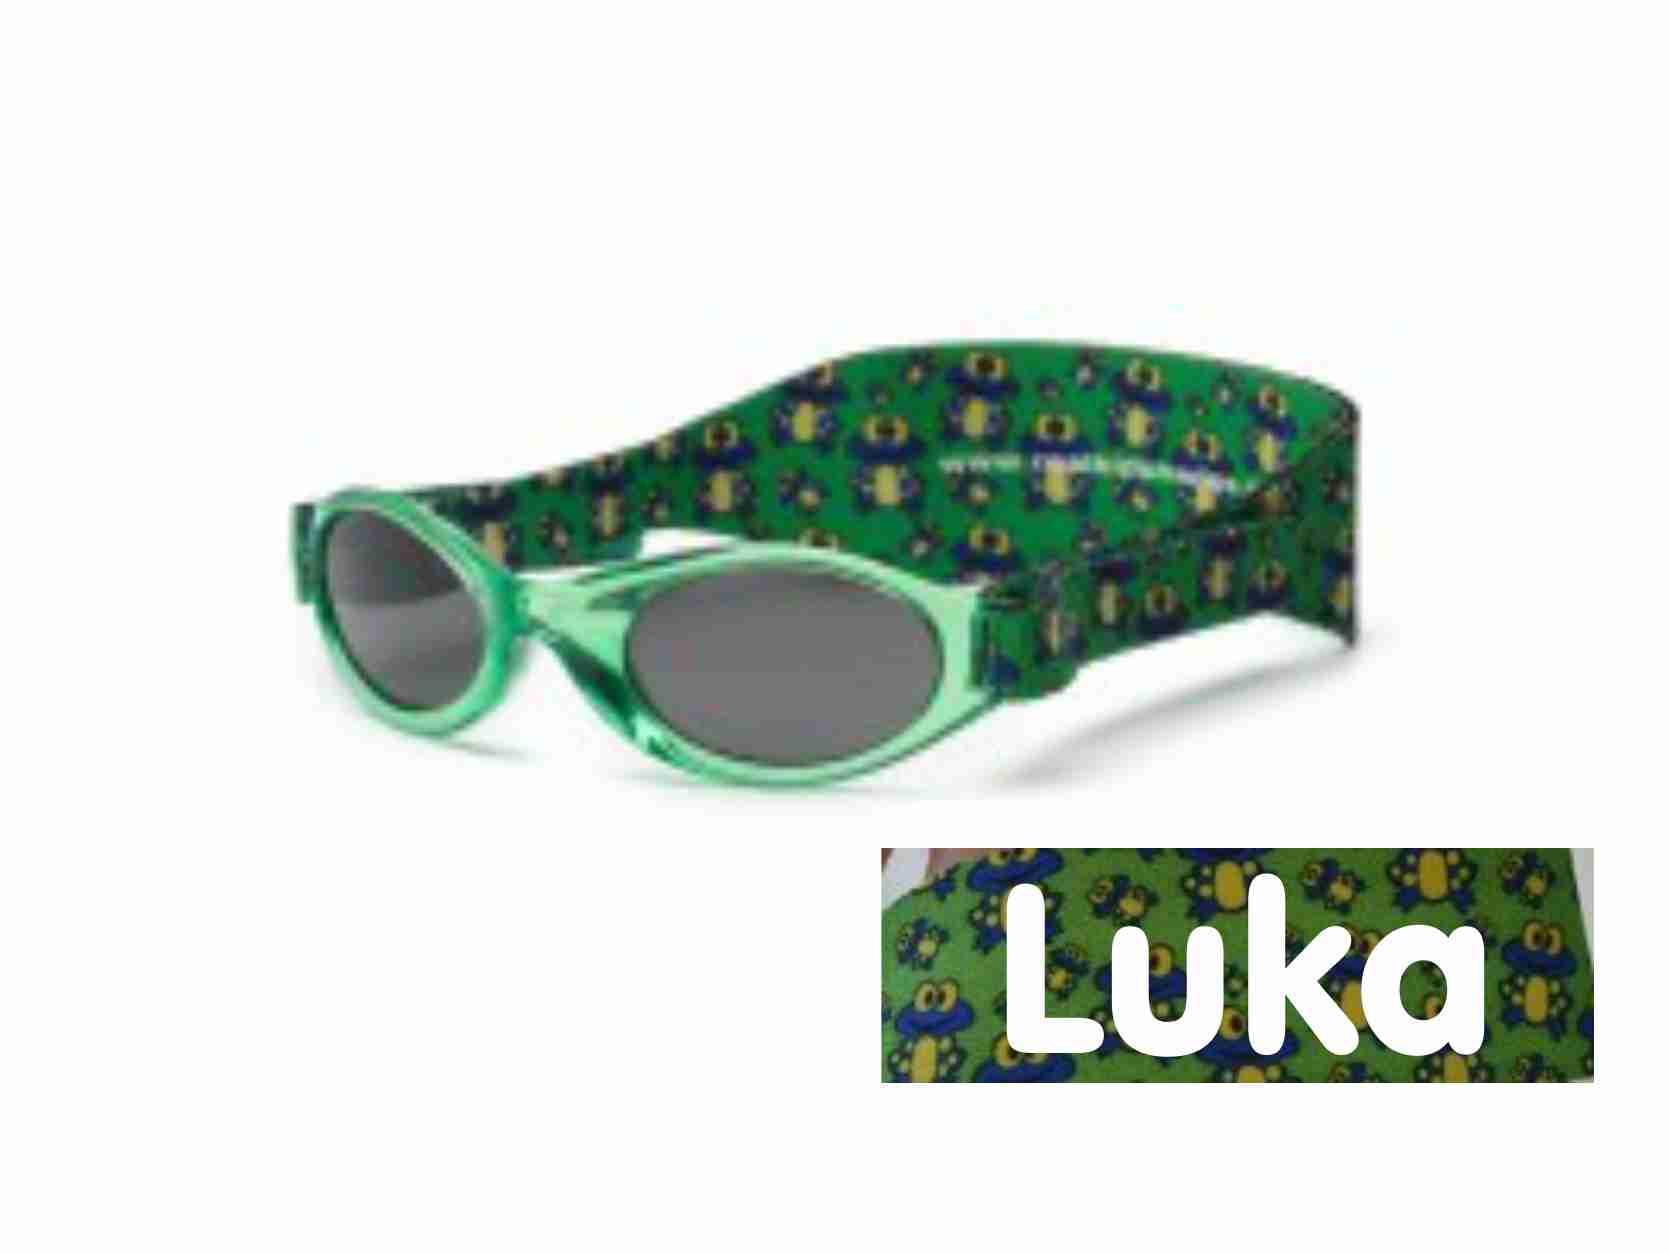 Otroška sončna očala RKS green frog (2-5) - unisex